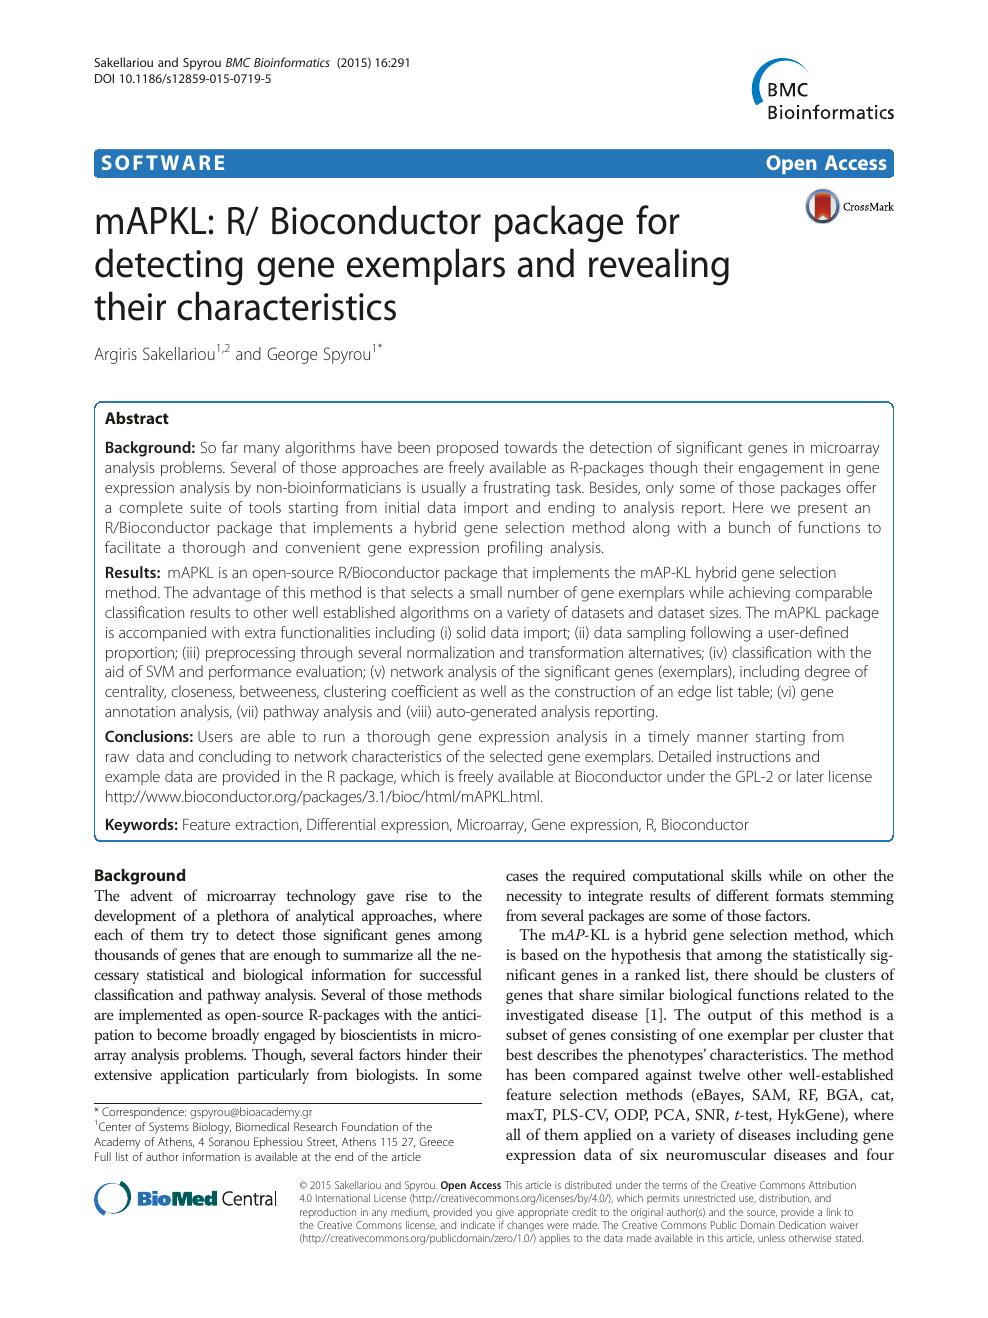 mAPKL: R/ Bioconductor package for detecting gene exemplars